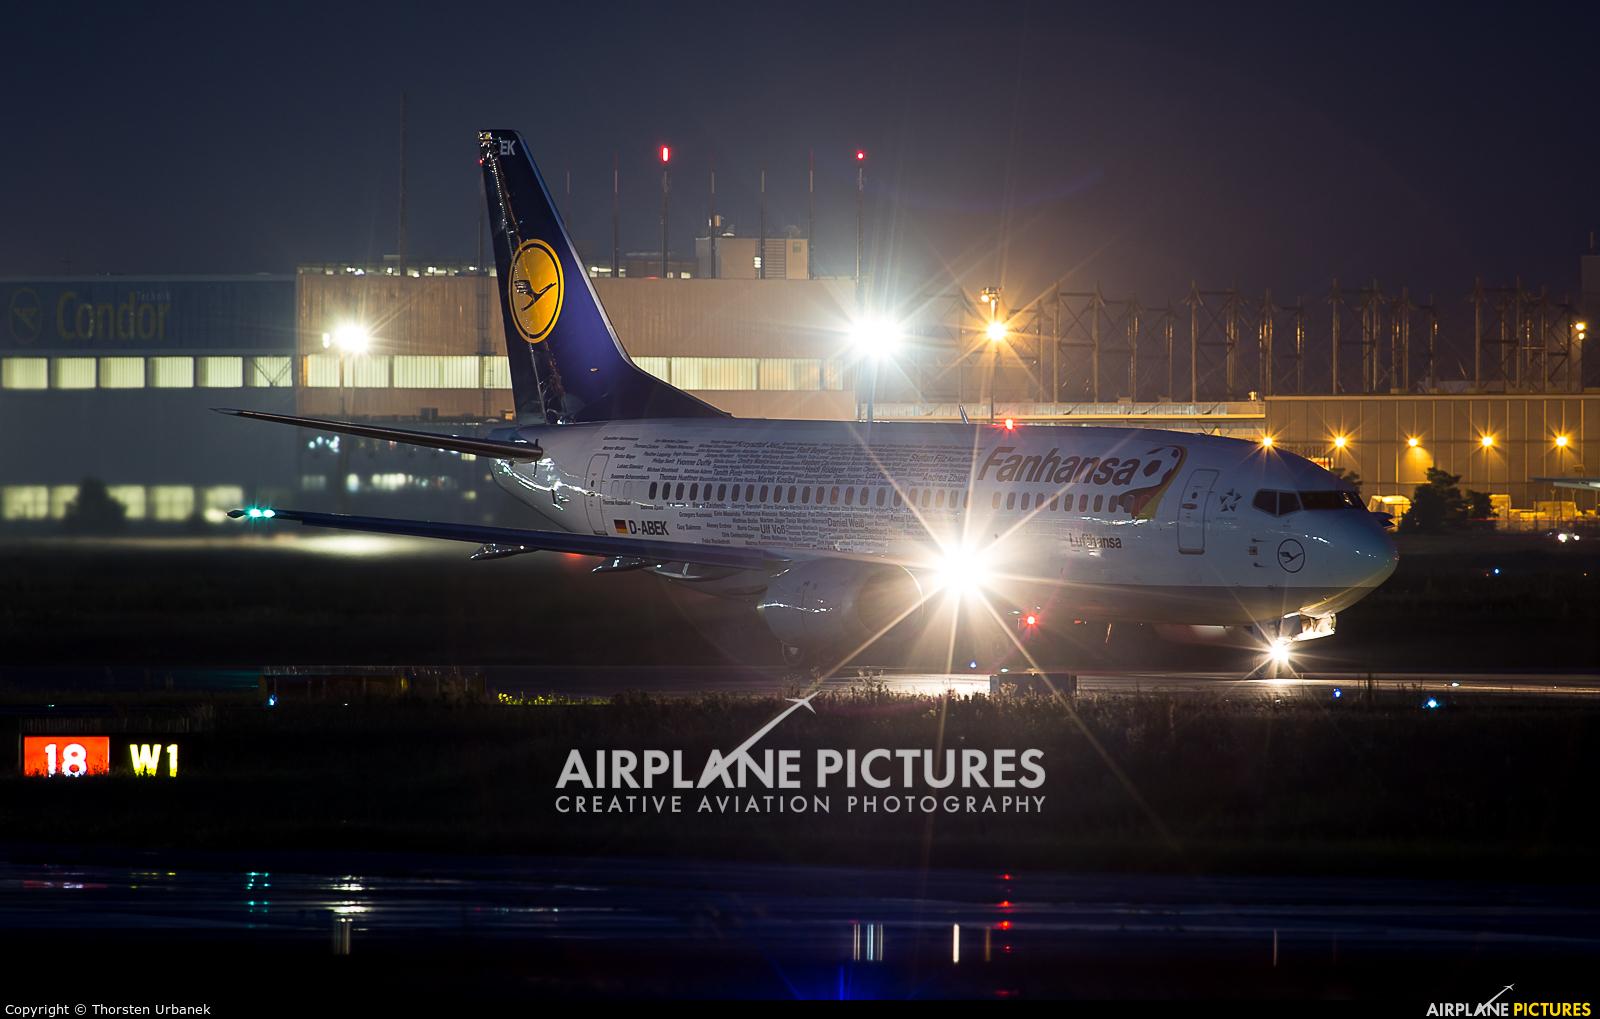 Lufthansa D-ABEK aircraft at Frankfurt